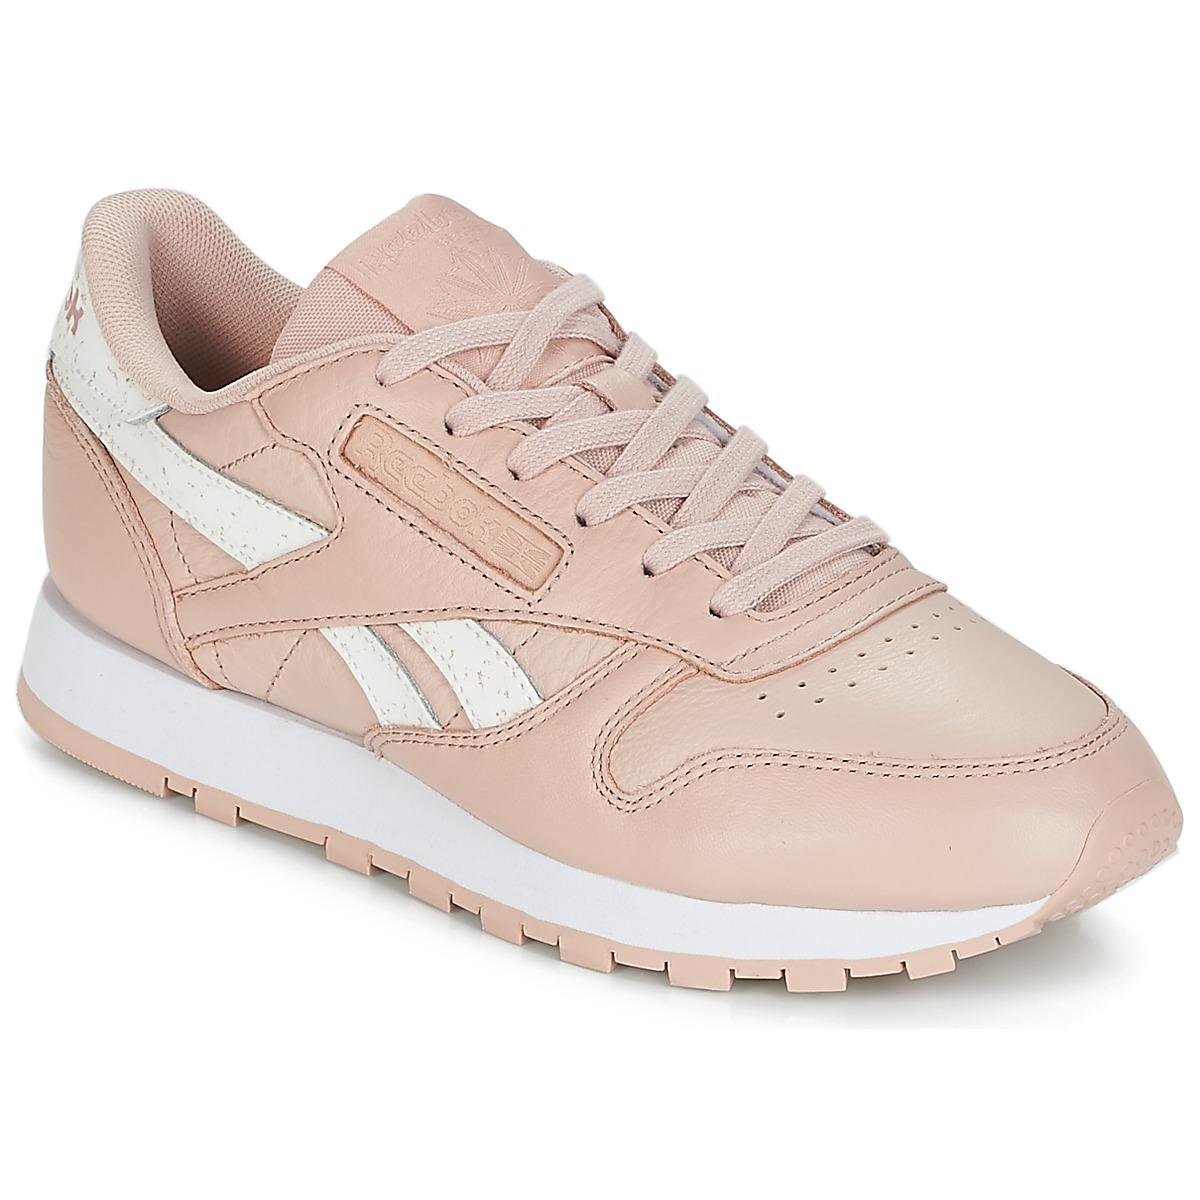 Reebok Classic CLASSIC LEATHER Rose / Weiss - Kostenloser Versand bei Spartoode ! - Schuhe Sneaker Low Damen 89,95 €